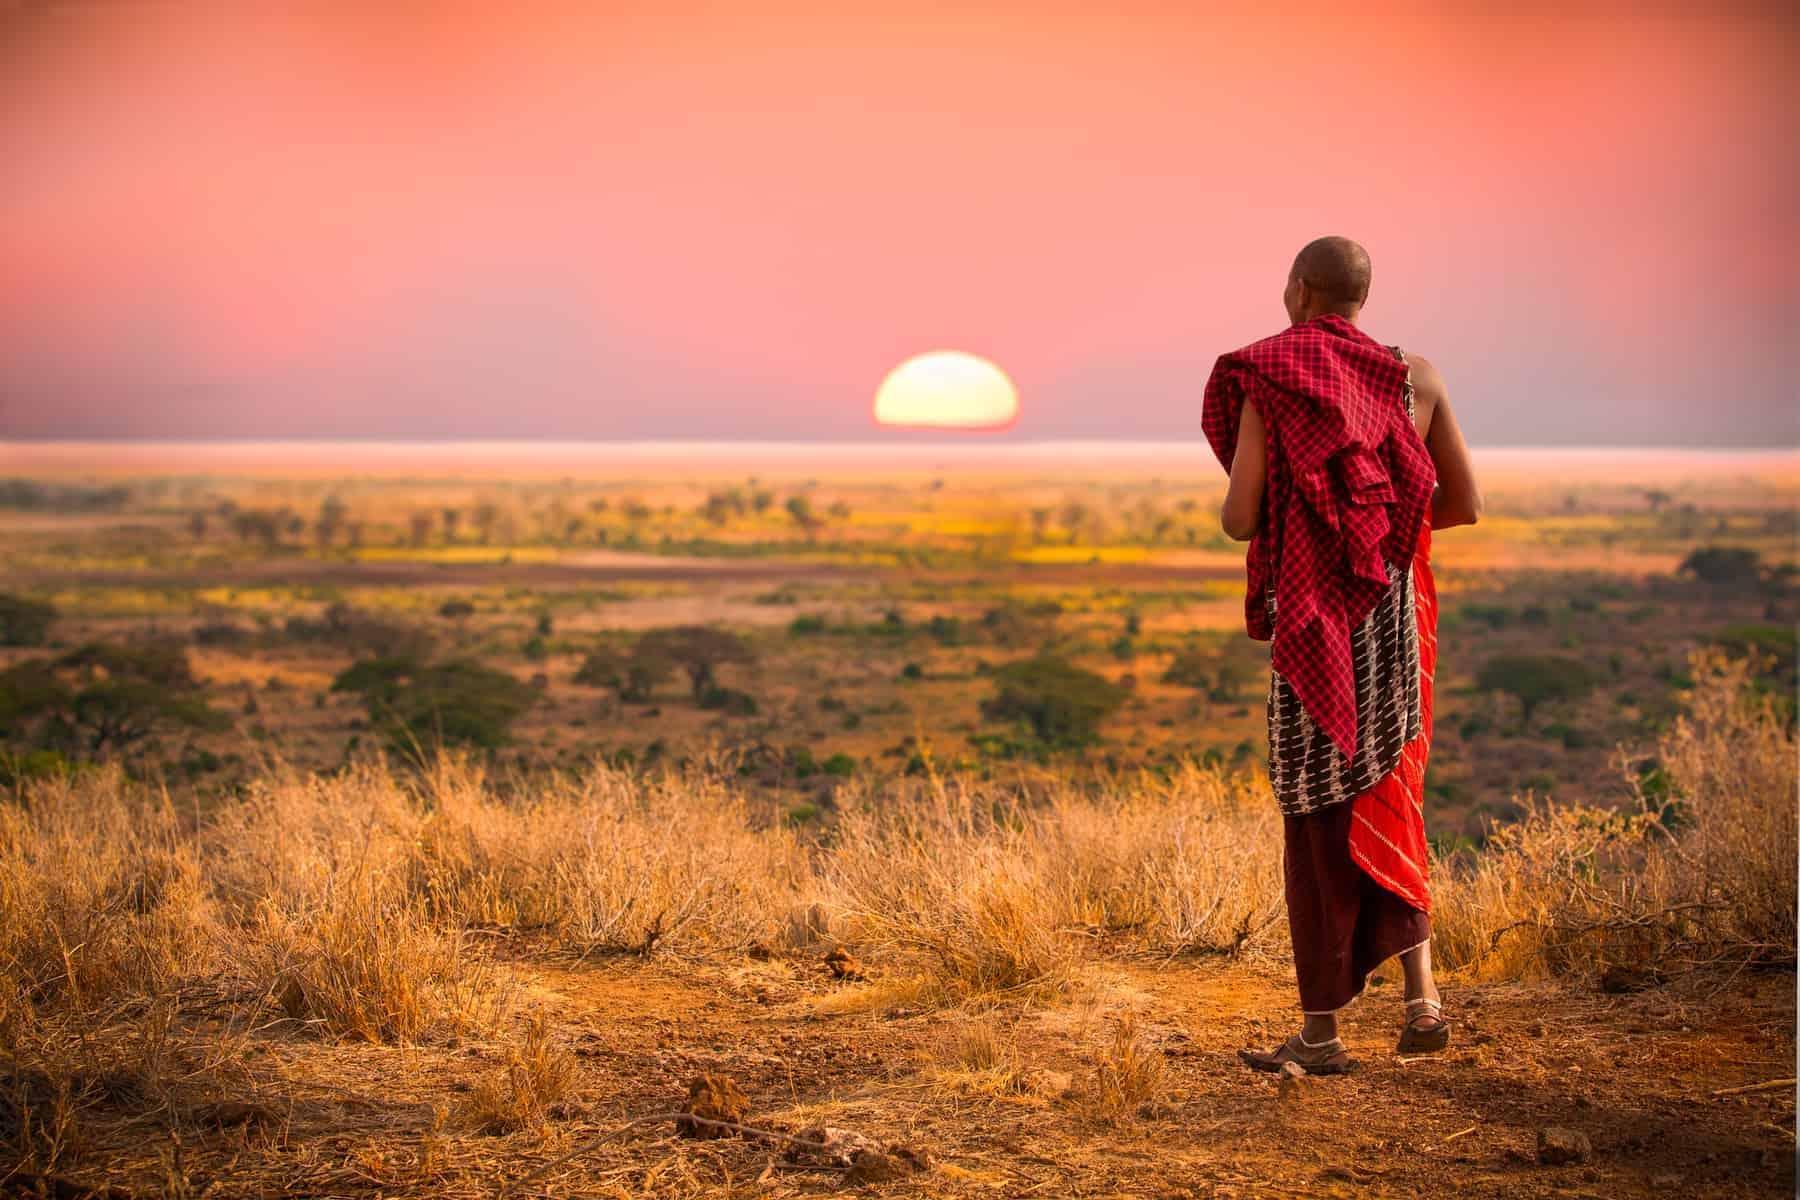 Masai man of Tanzania